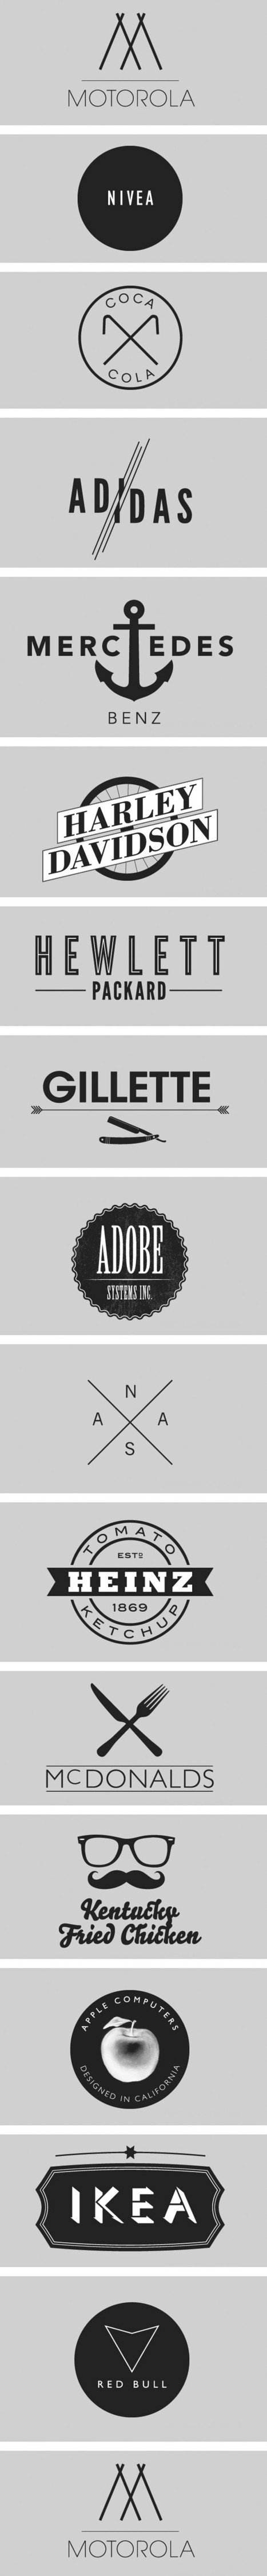 Random but GOOD | timms brand design | Scoop.it